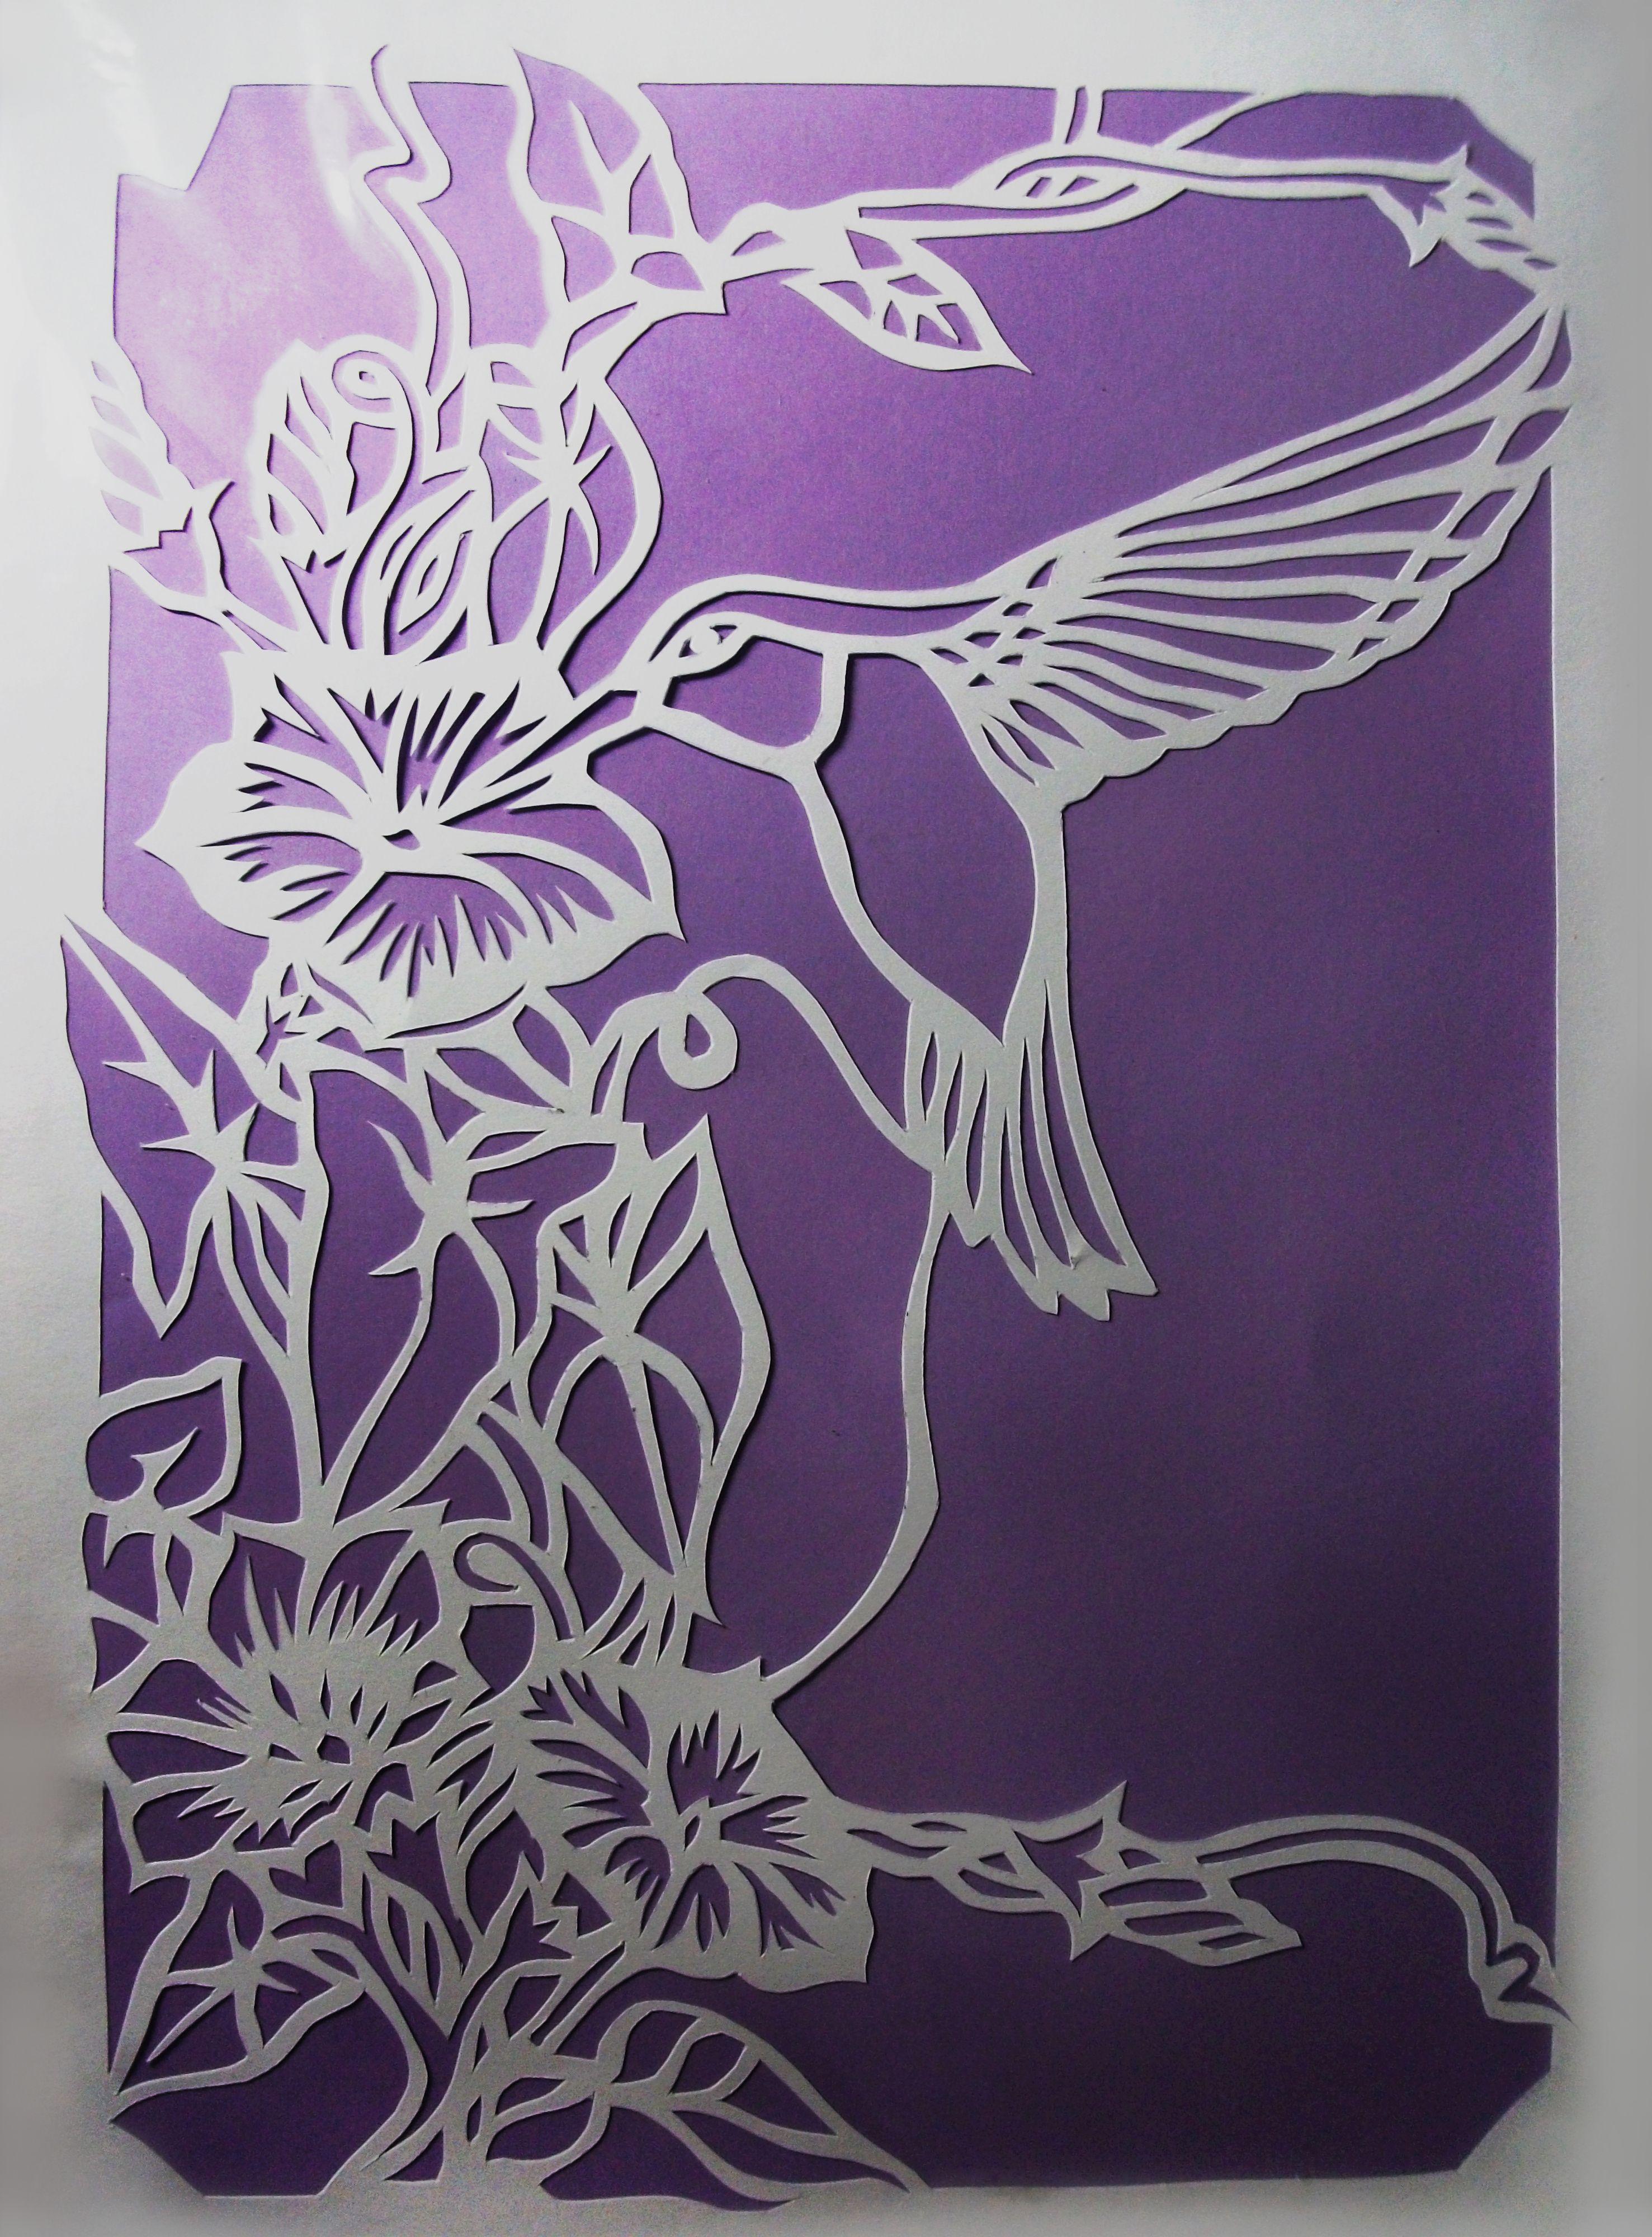 d n n n d d d dod arte pinterest papercutting paper cutting and kirigami